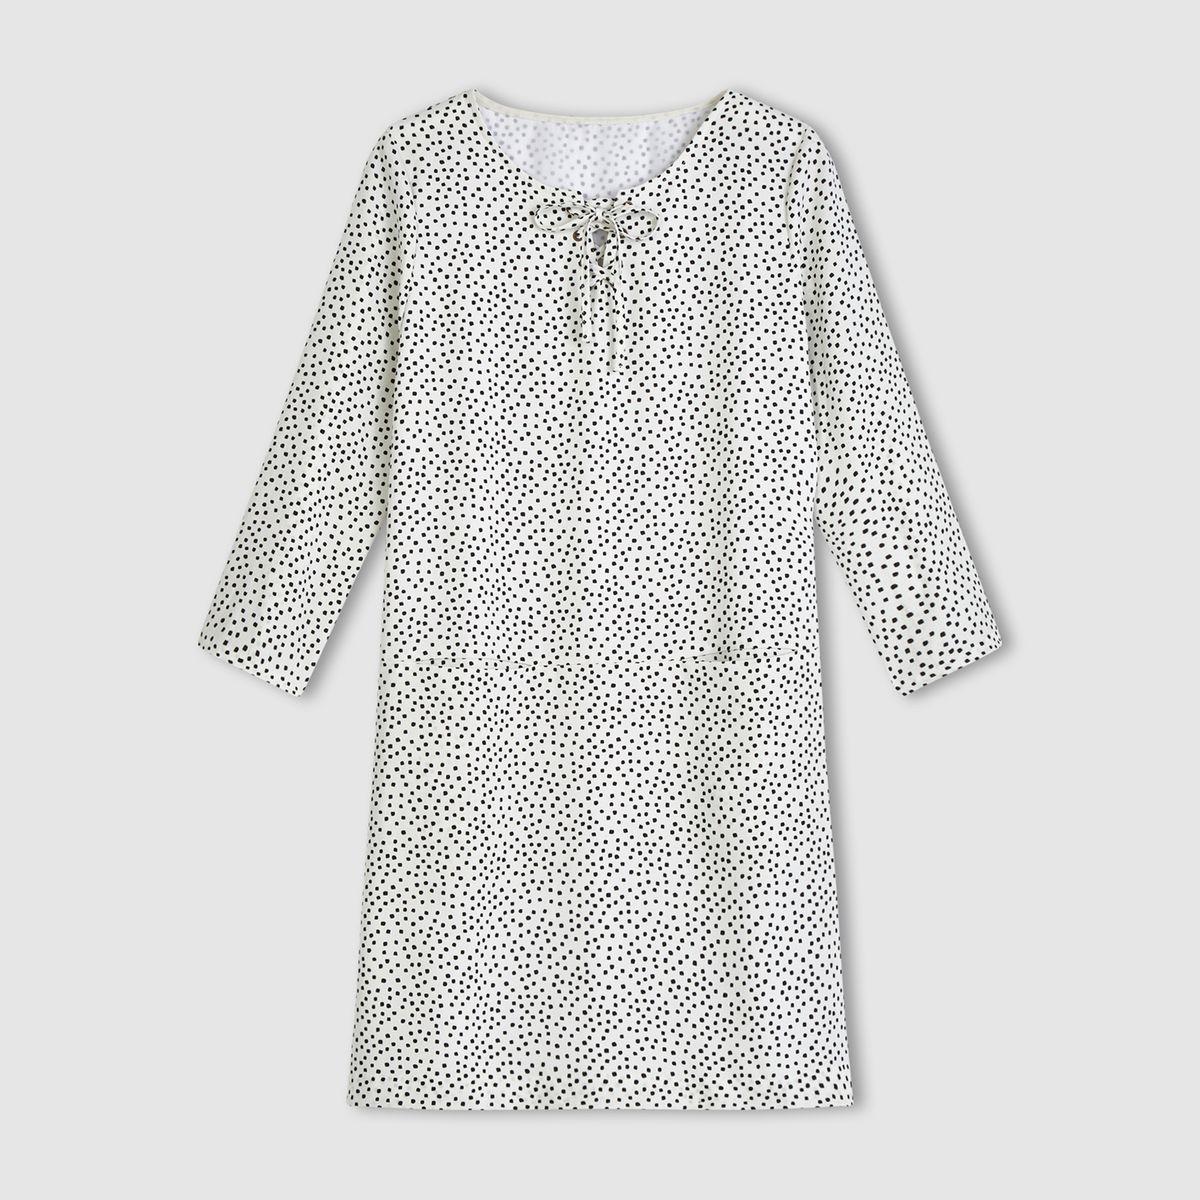 Robe courte manches 3/4 encolure lacée